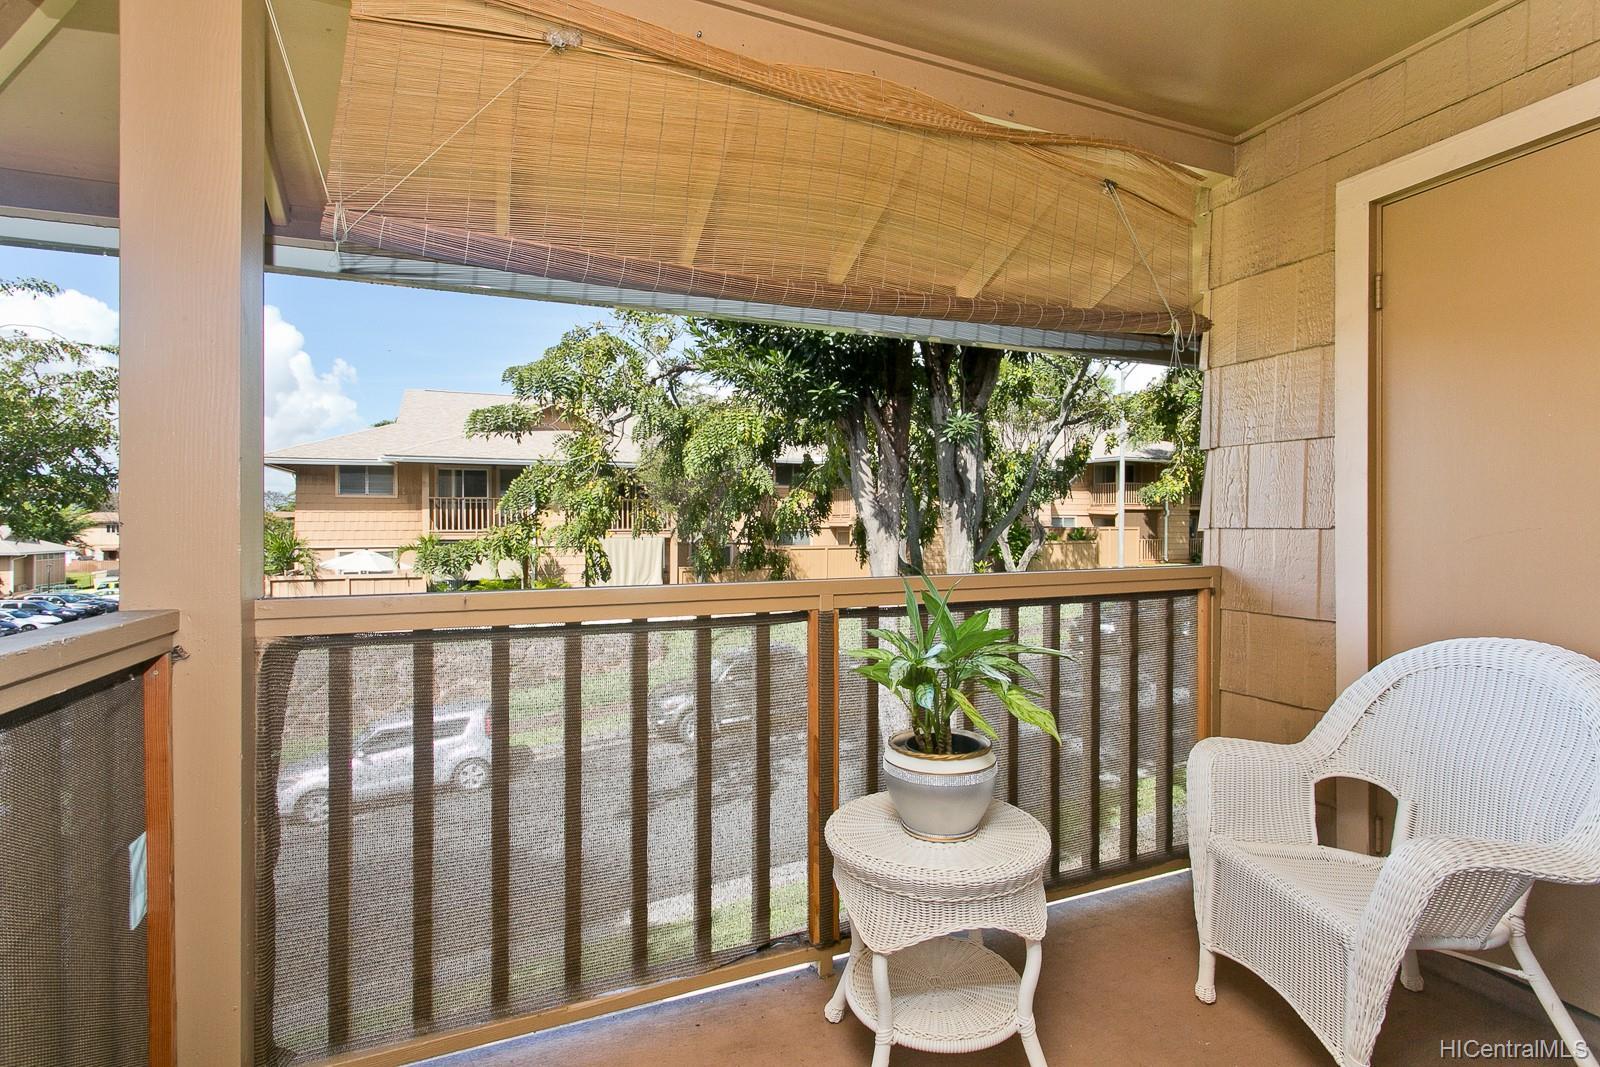 98-1369 Koaheahe Place townhouse # 9/88, Pearl City, Hawaii - photo 16 of 17